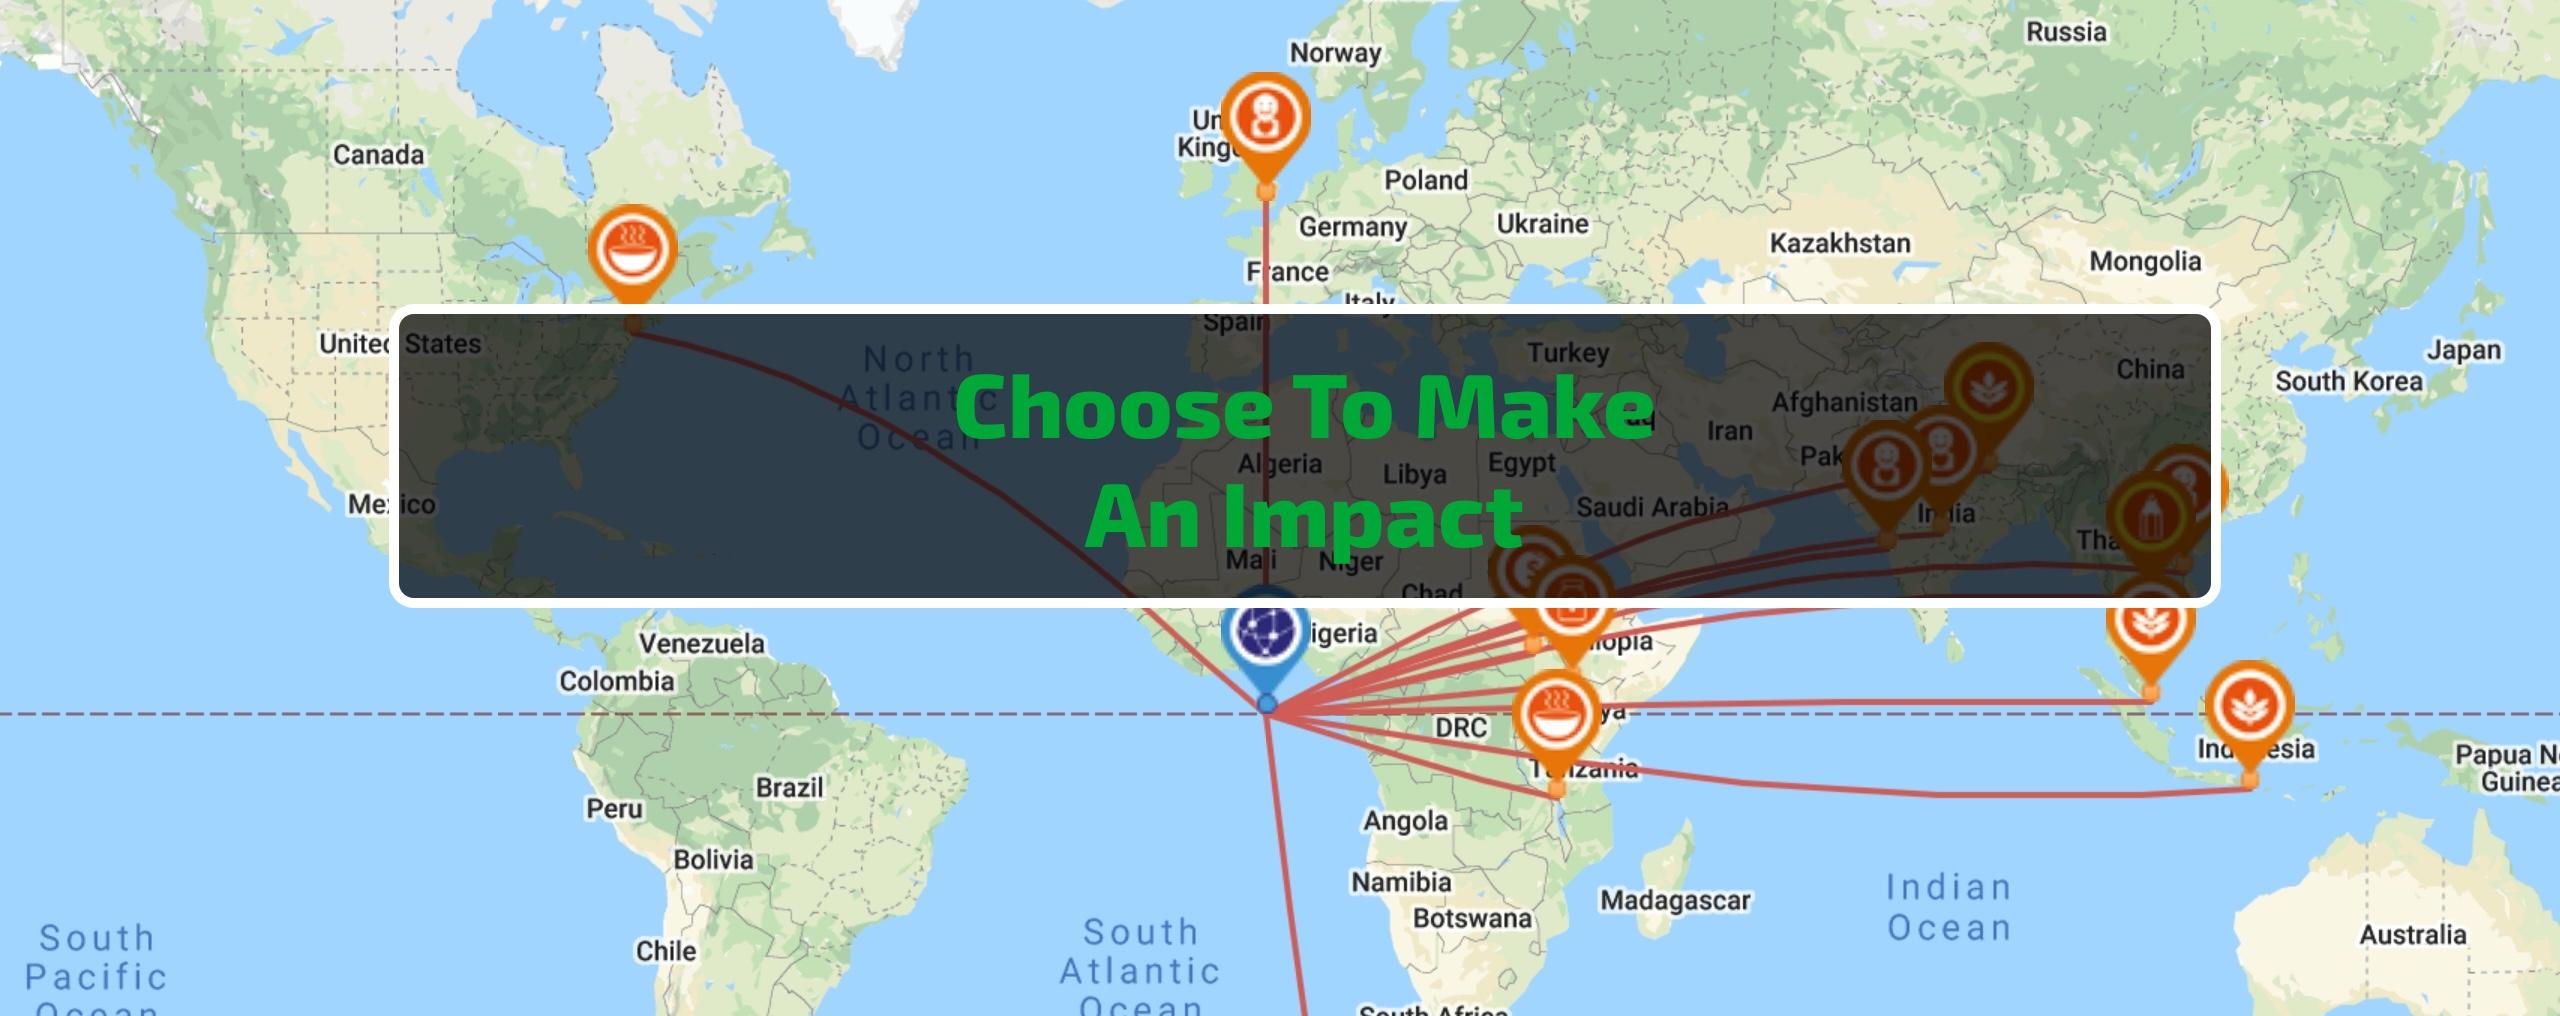 Already making a positive impact - making a positive impact